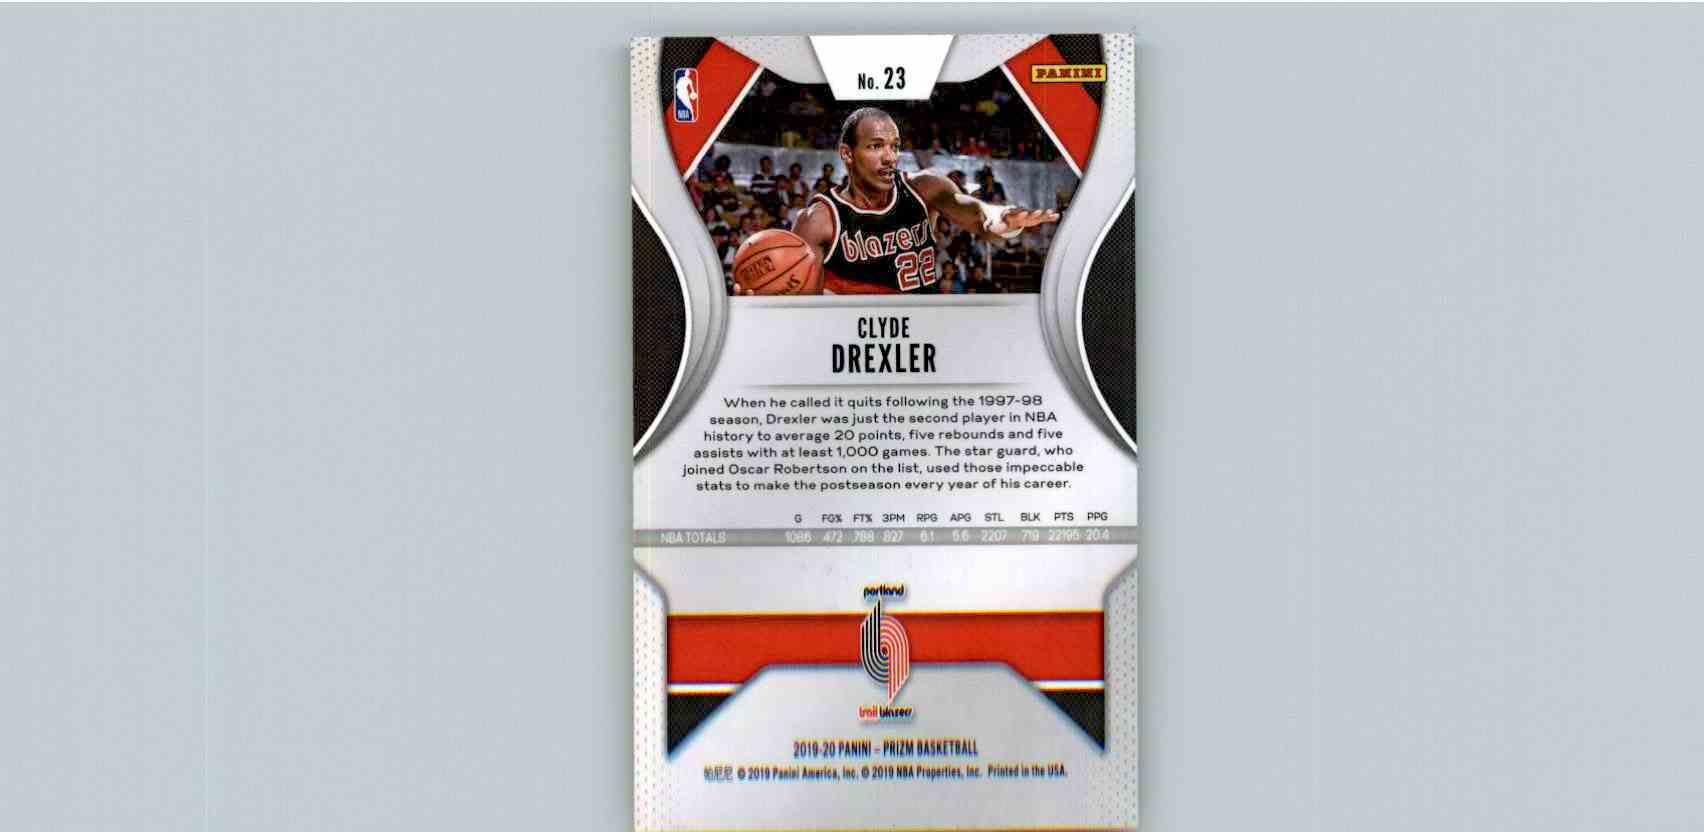 2019-20 Panini Prizm Basketball Prizm Clyde Drexler #23 card front image